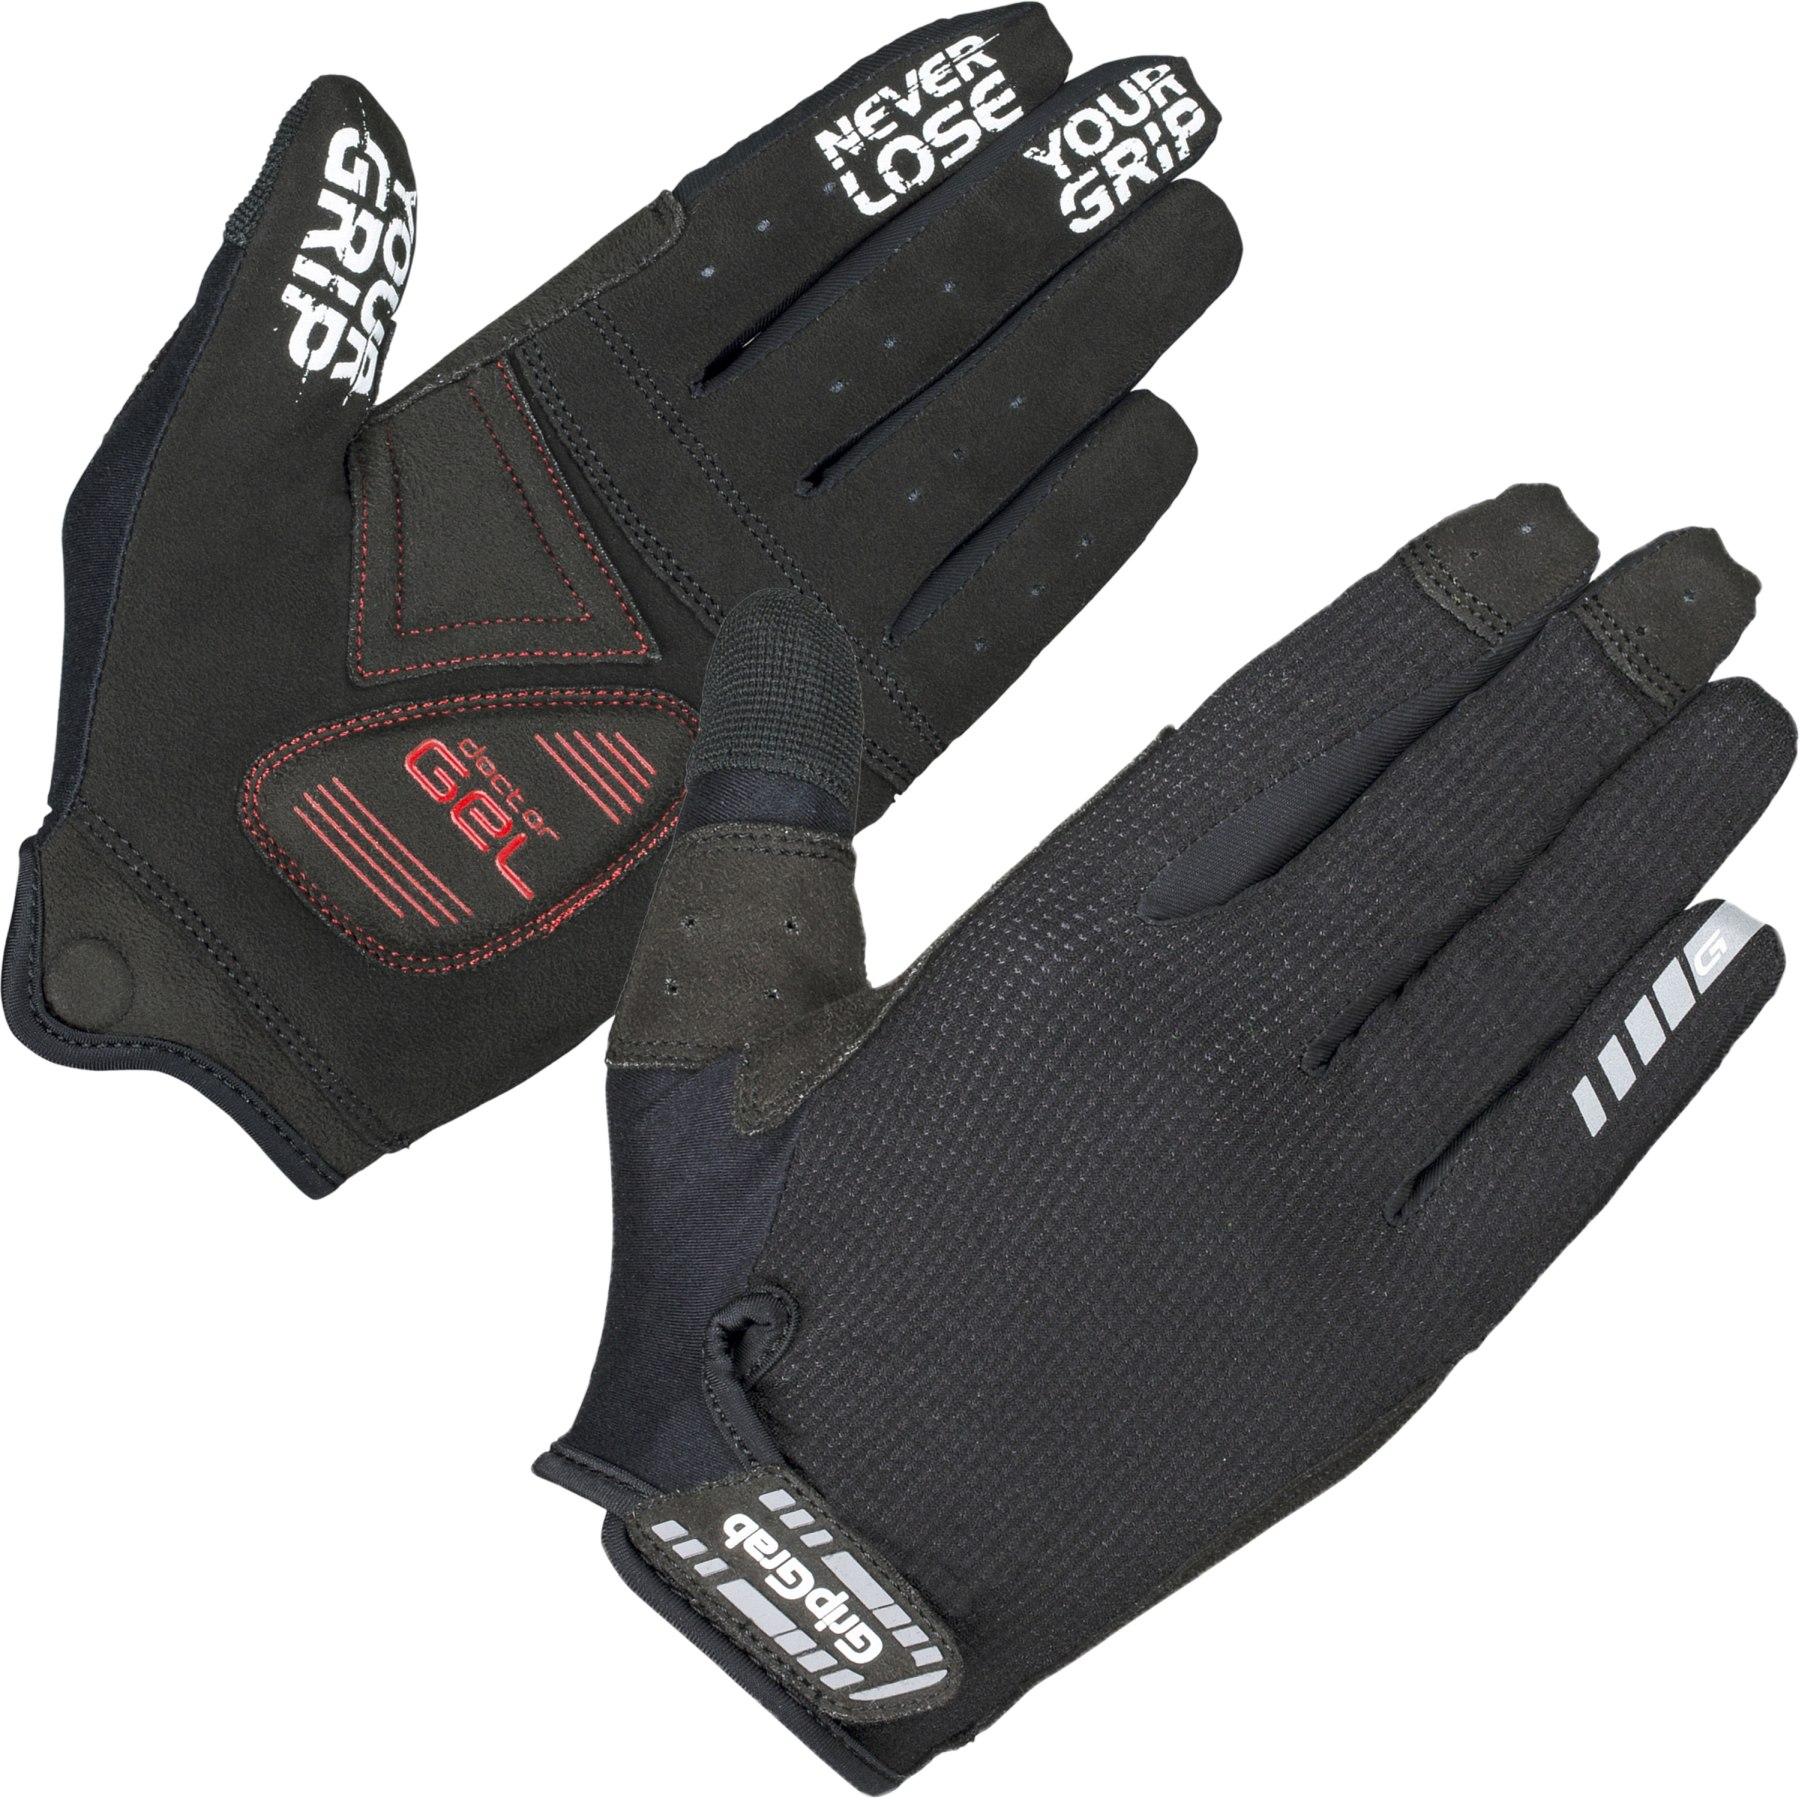 Image of GripGrab SuperGel XC Touchscreen Full Finger Glove - Black